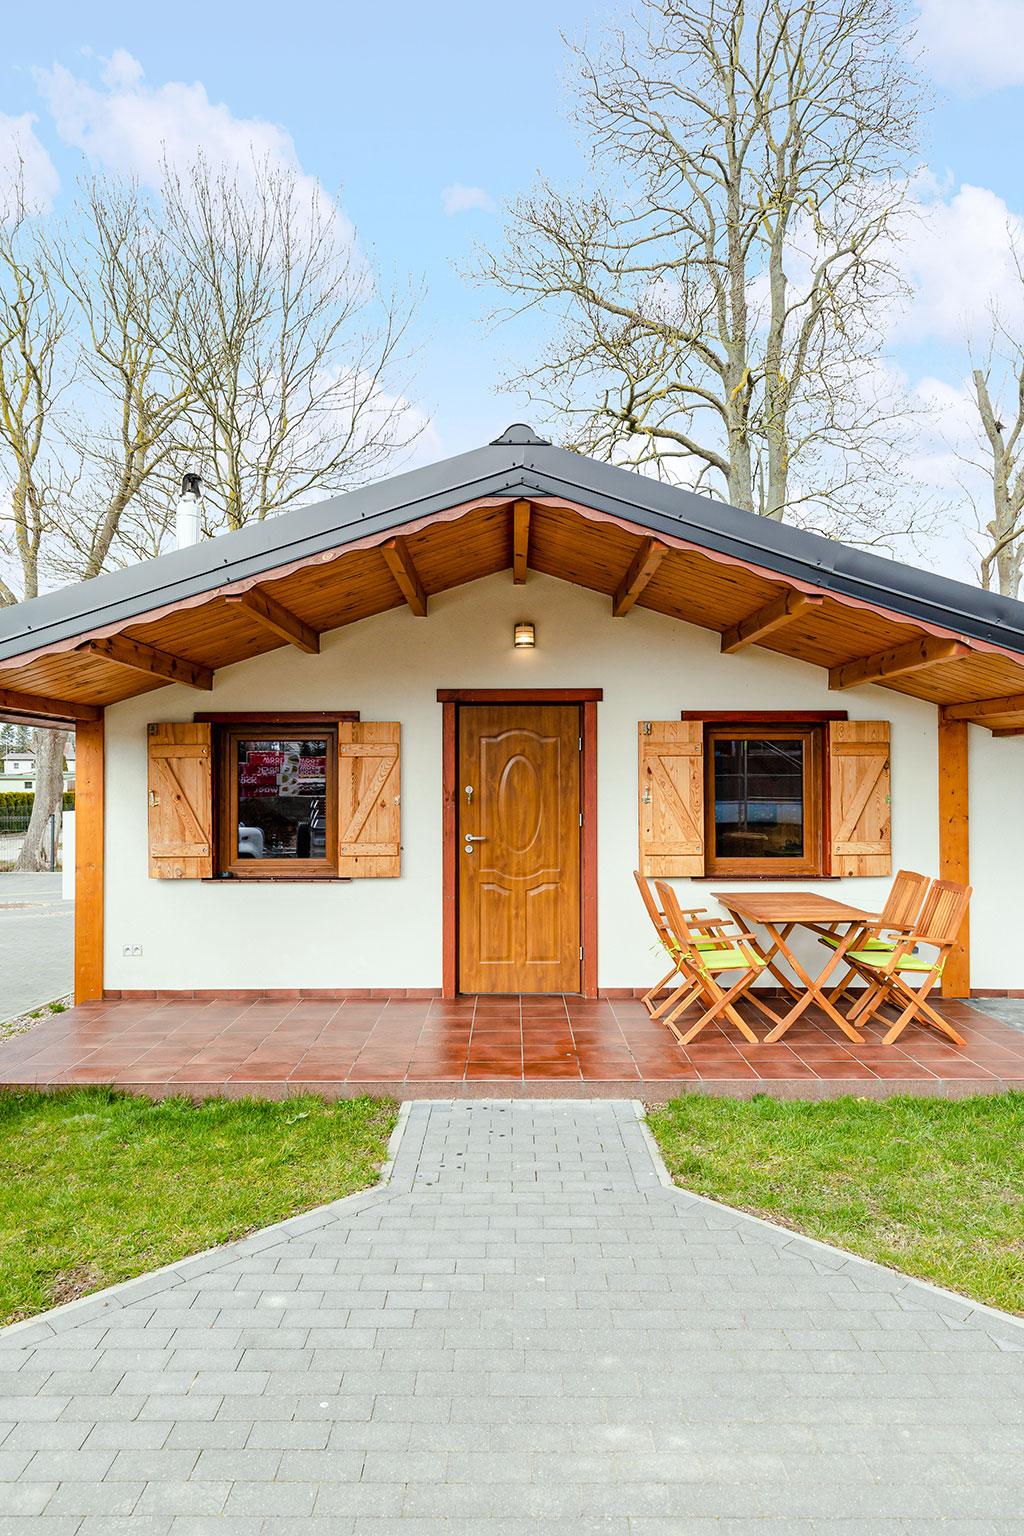 Reihenhaus 2 Pers. Ferienhaus in Polen